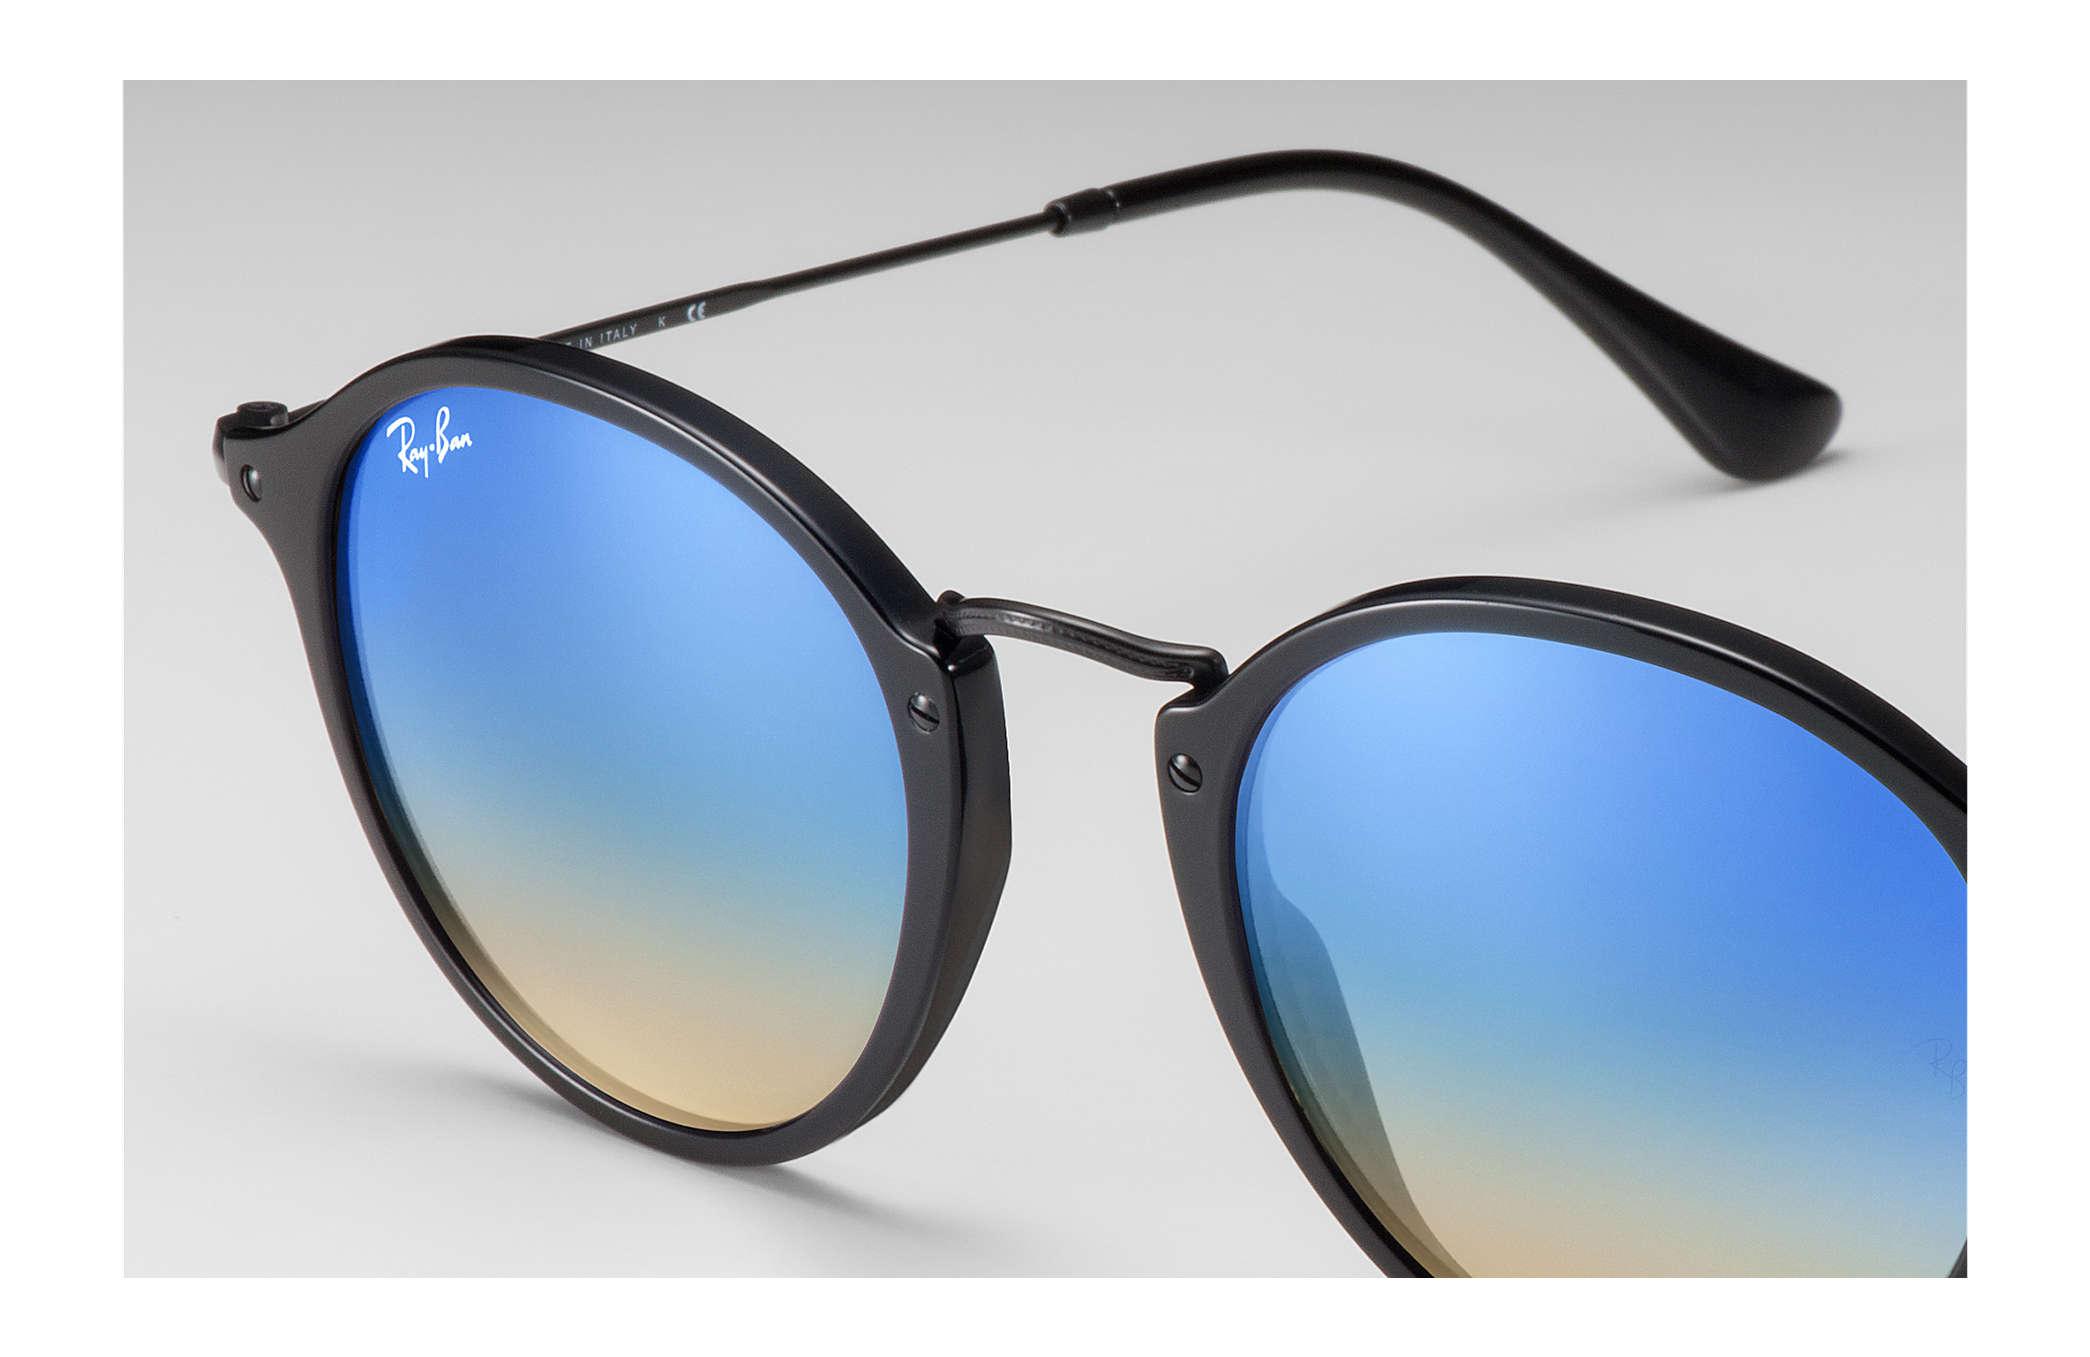 c25fbd1e0d4 Ray-Ban Round Fleck Flash Lenses Gradient RB2447 Black - Acetate ...